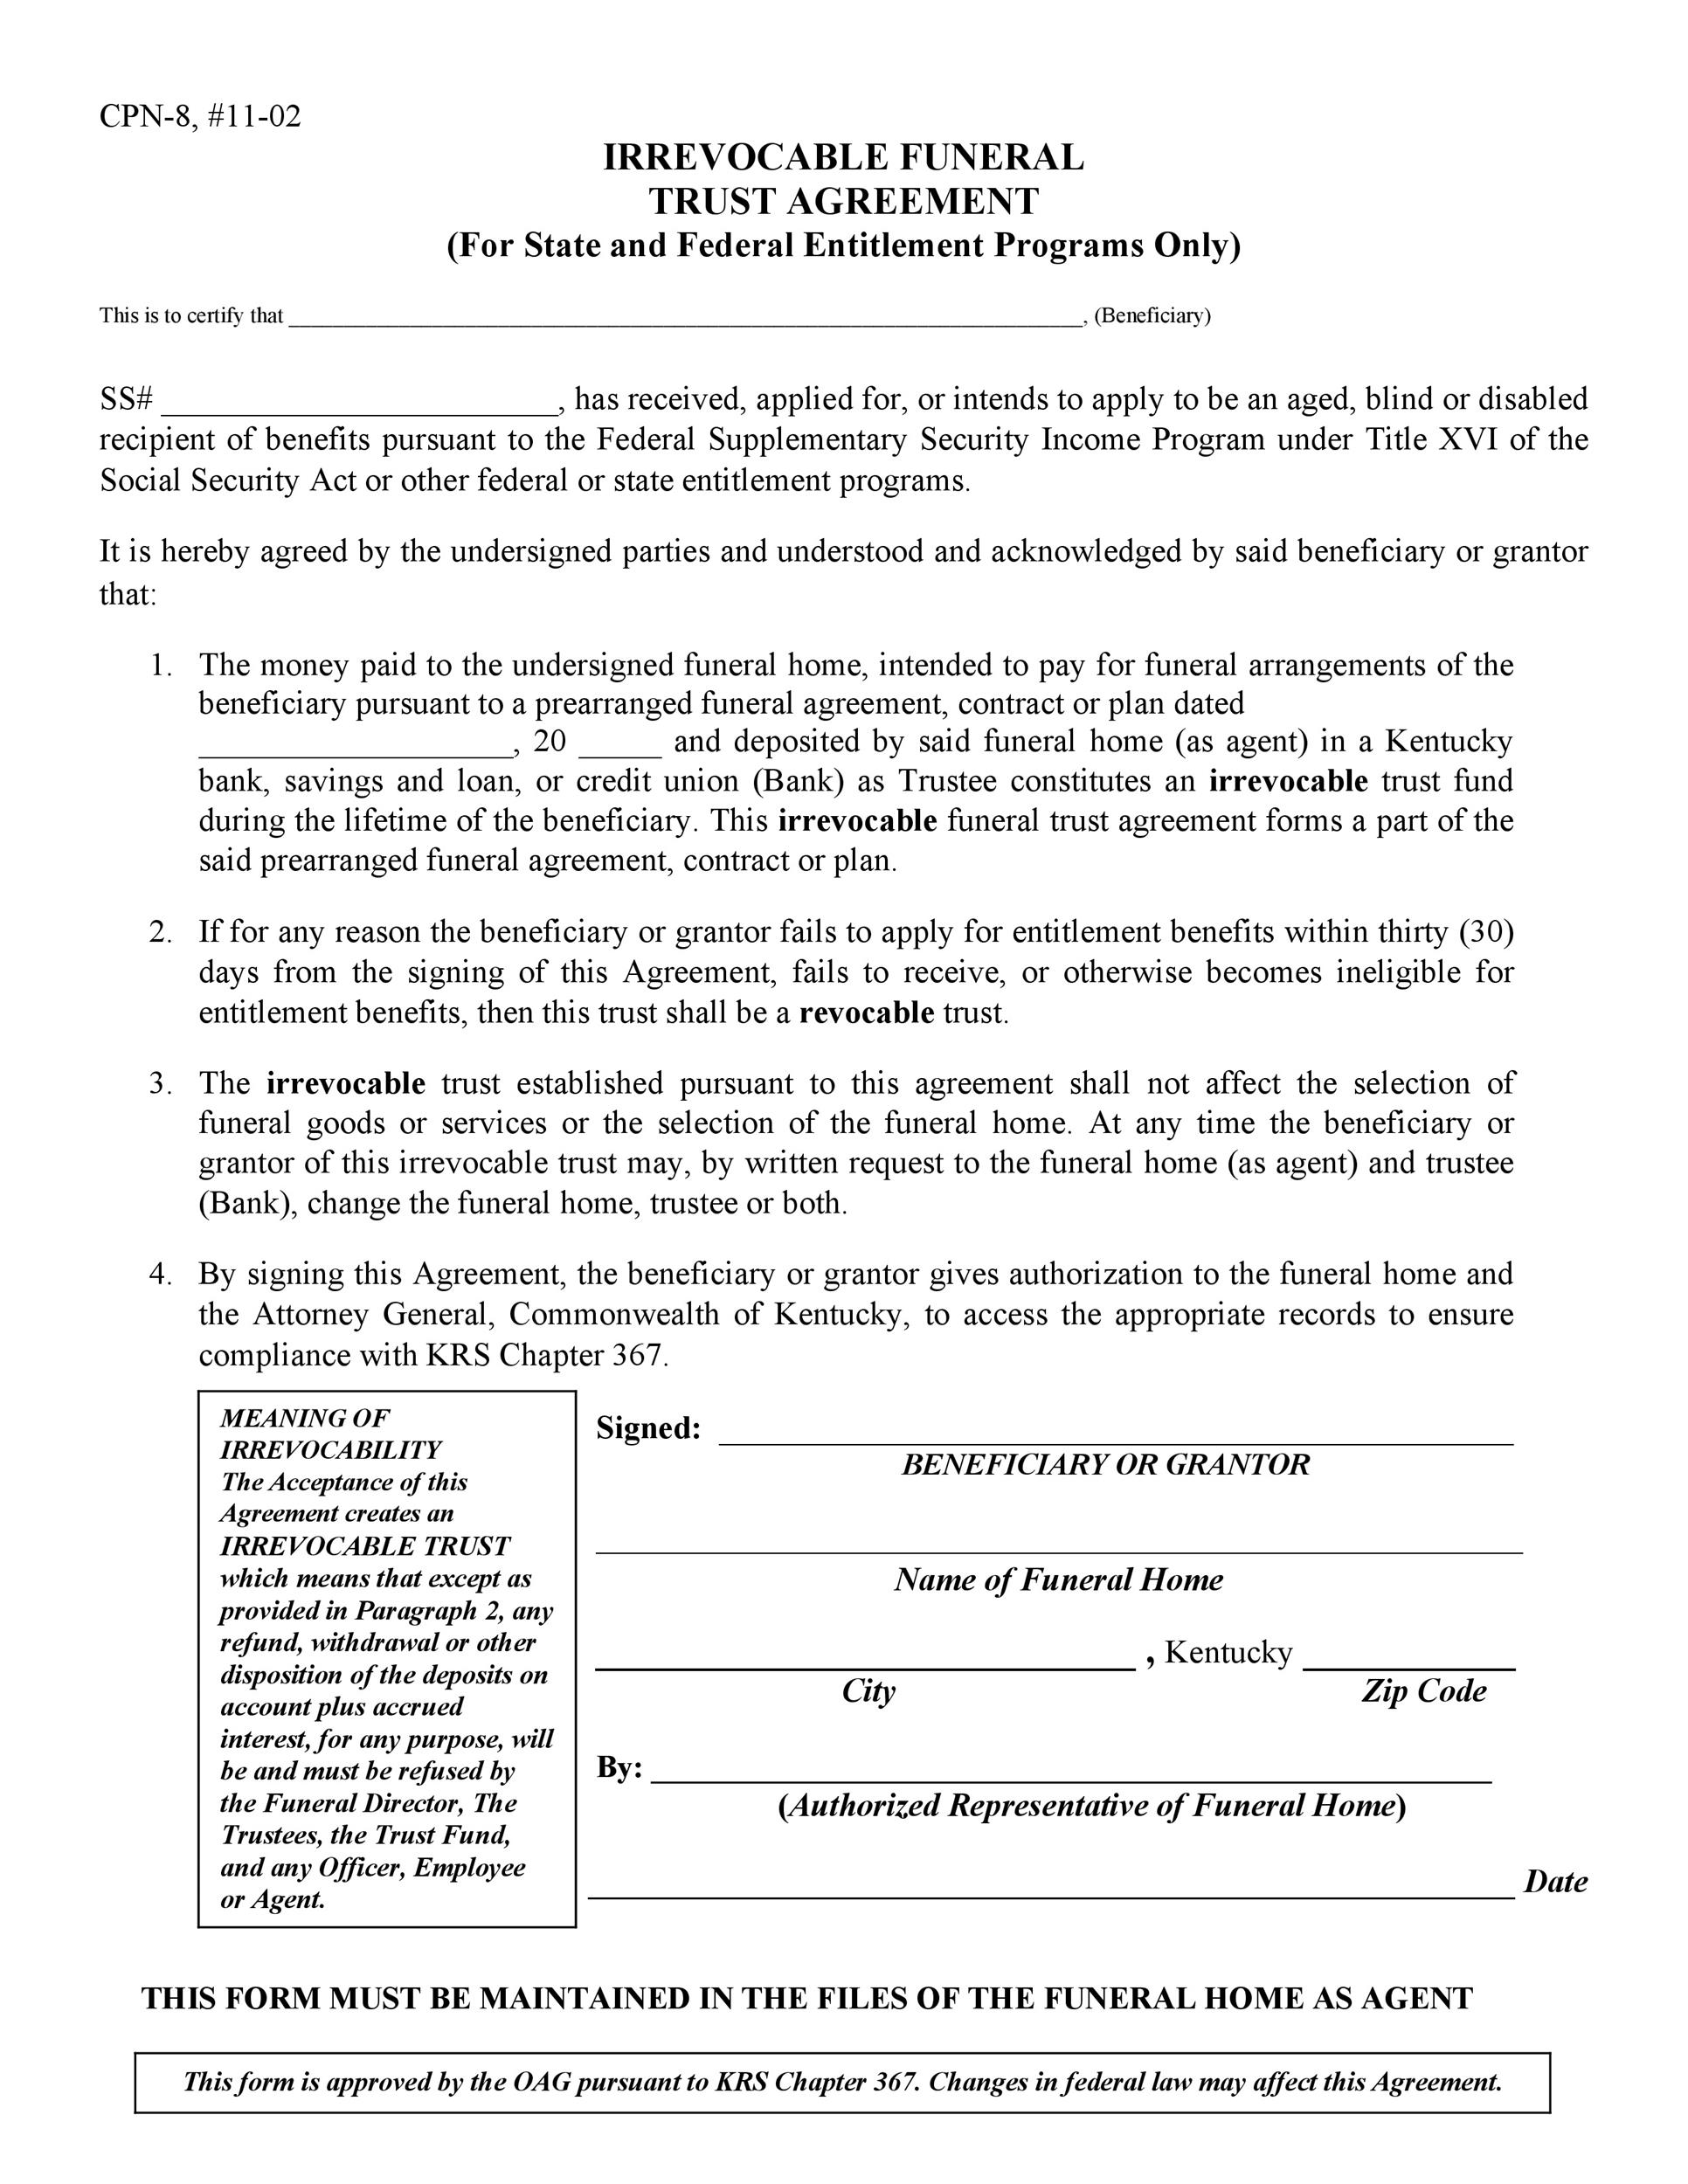 Free trust agreement 47